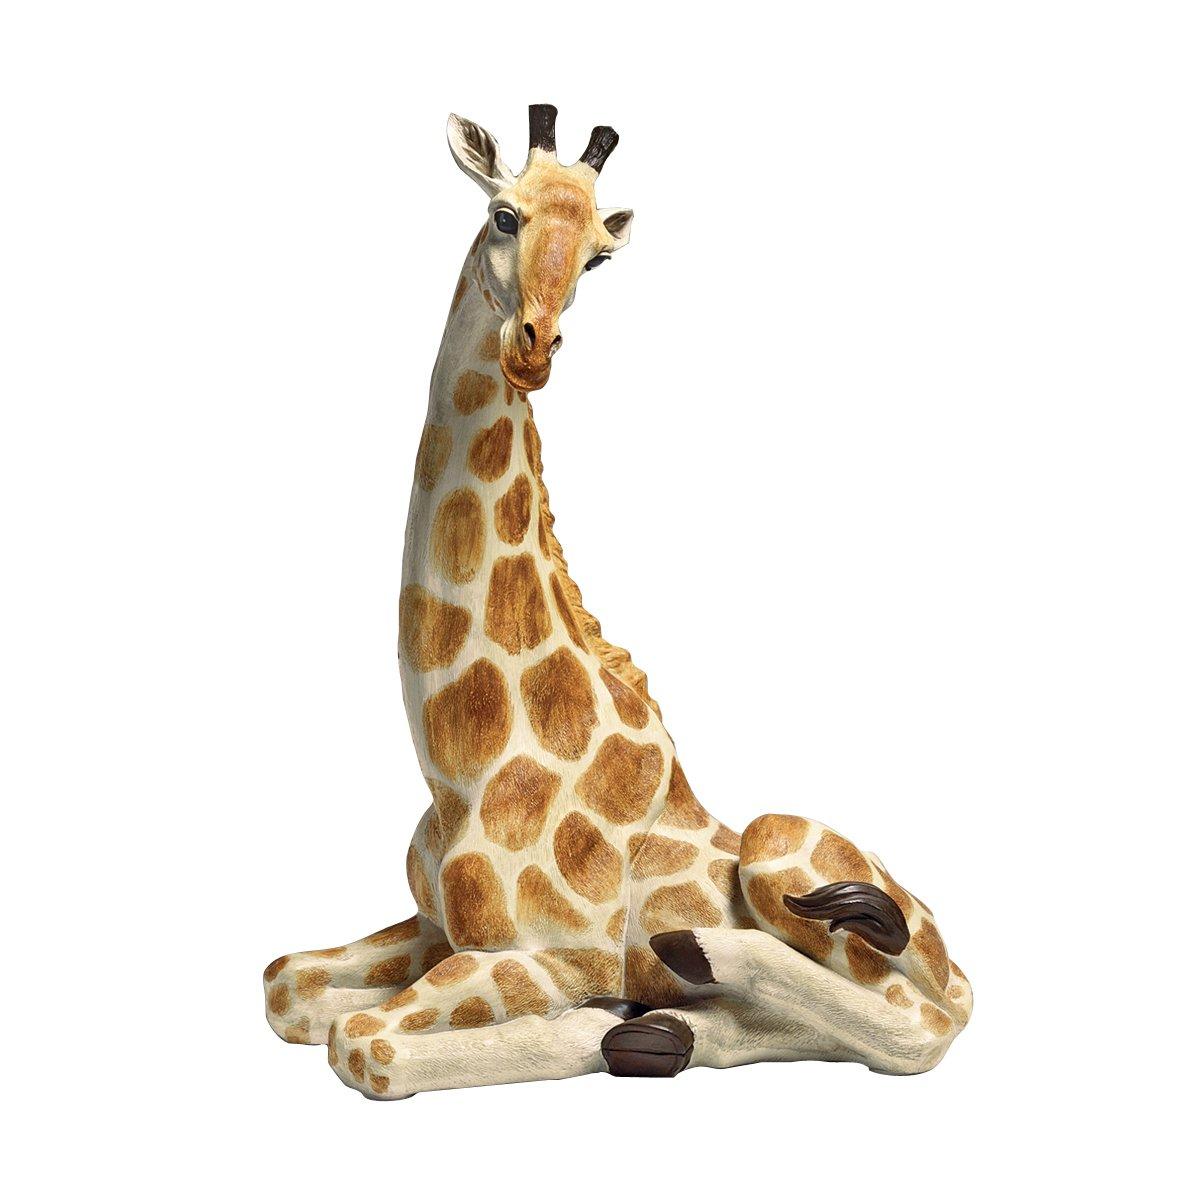 Amazon.com : Design Toscano Zari, The Resting Giraffe Statue : Garden U0026  Outdoor